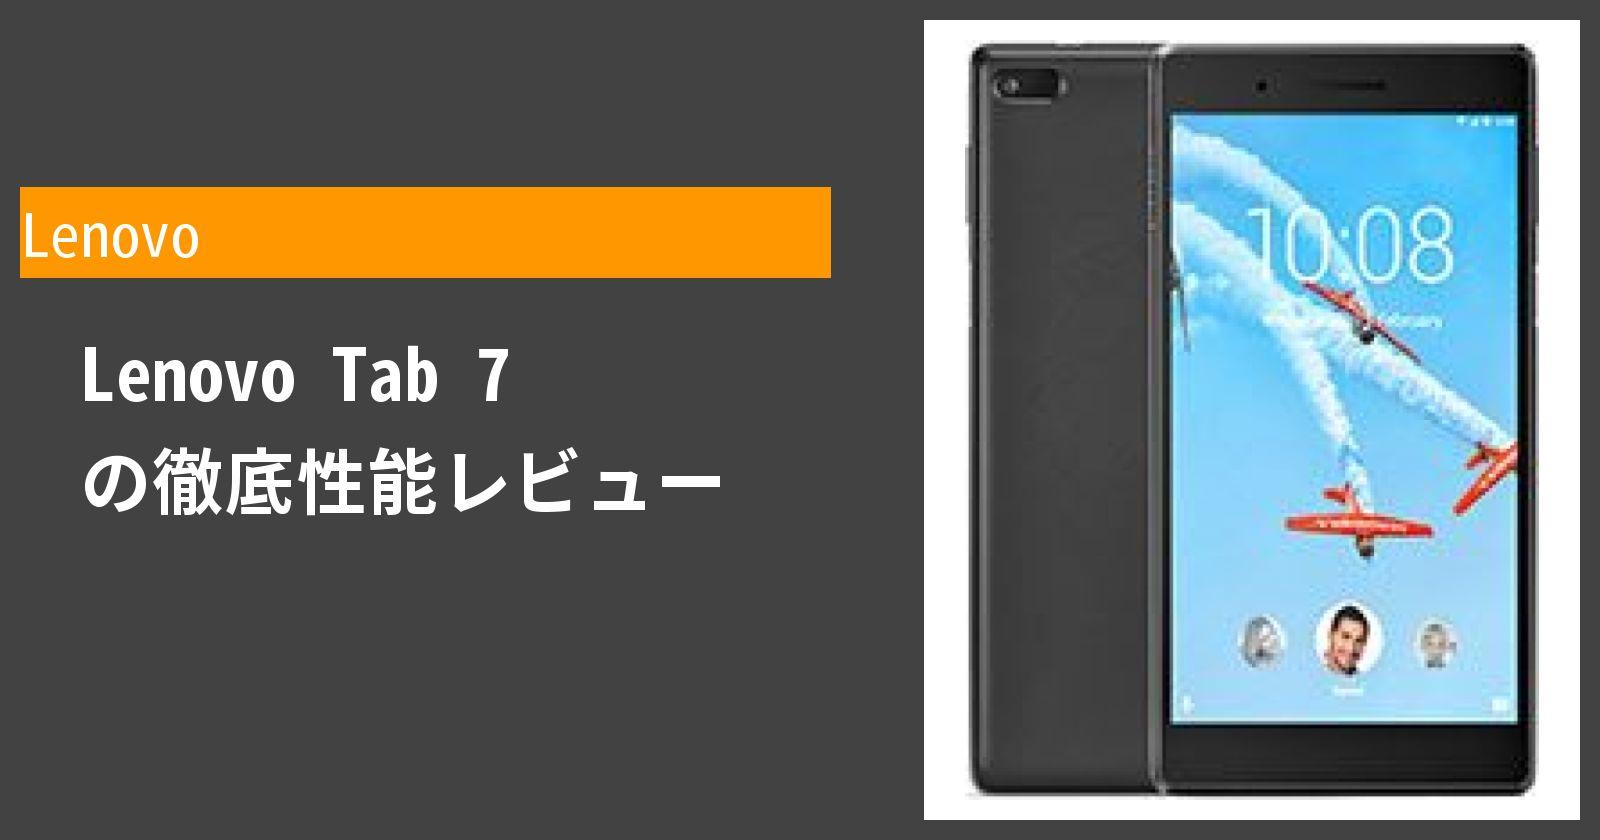 Lenovo Tab 7 の徹底性能レビュー